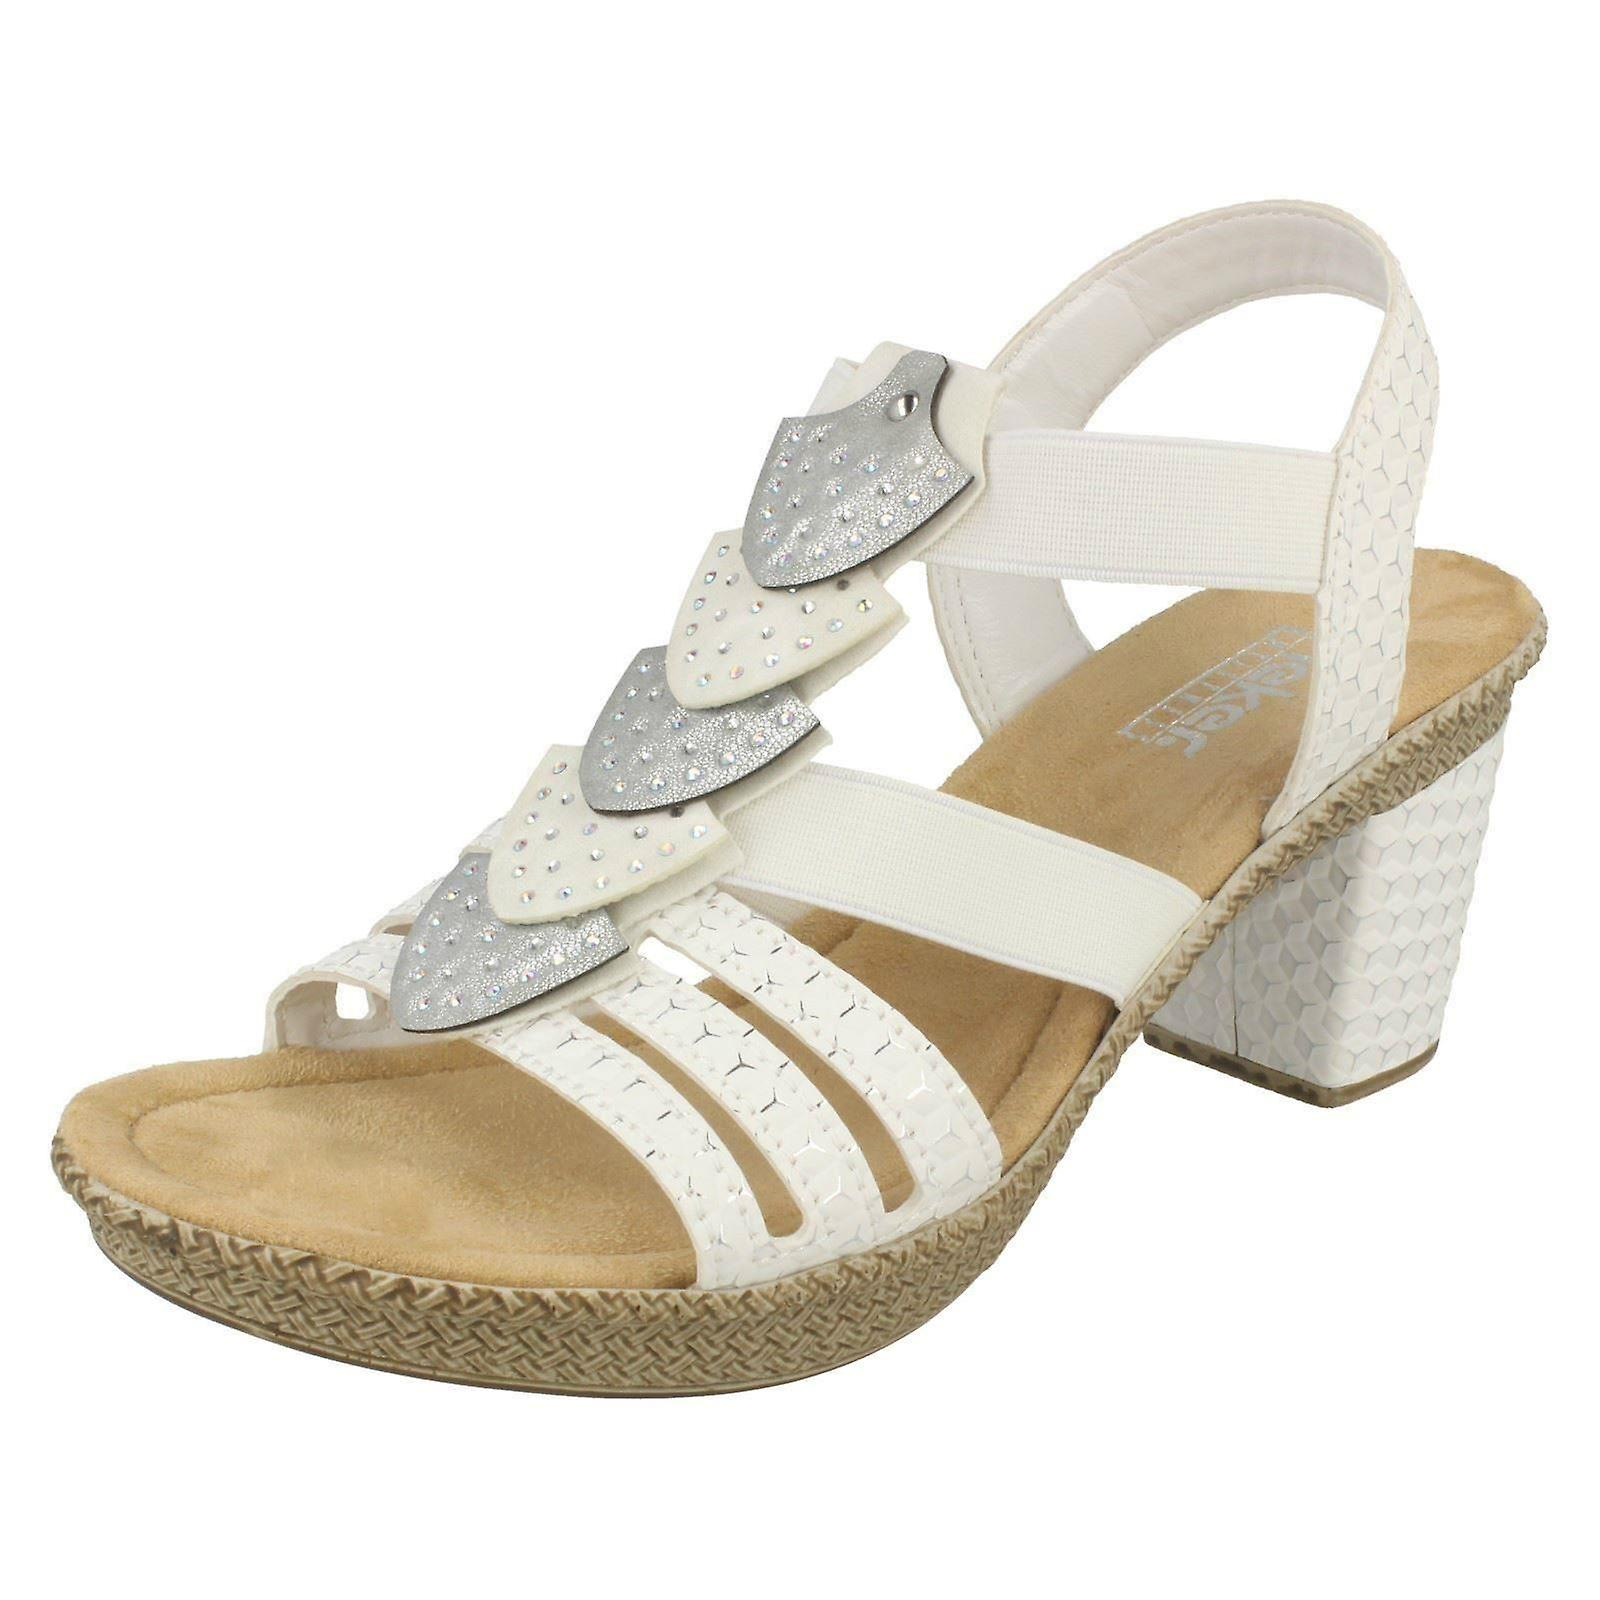 Ladies Rieker Slingback Sandals 66514 80 White Synthetic UK Size 6 EU Size 39 US Size 8